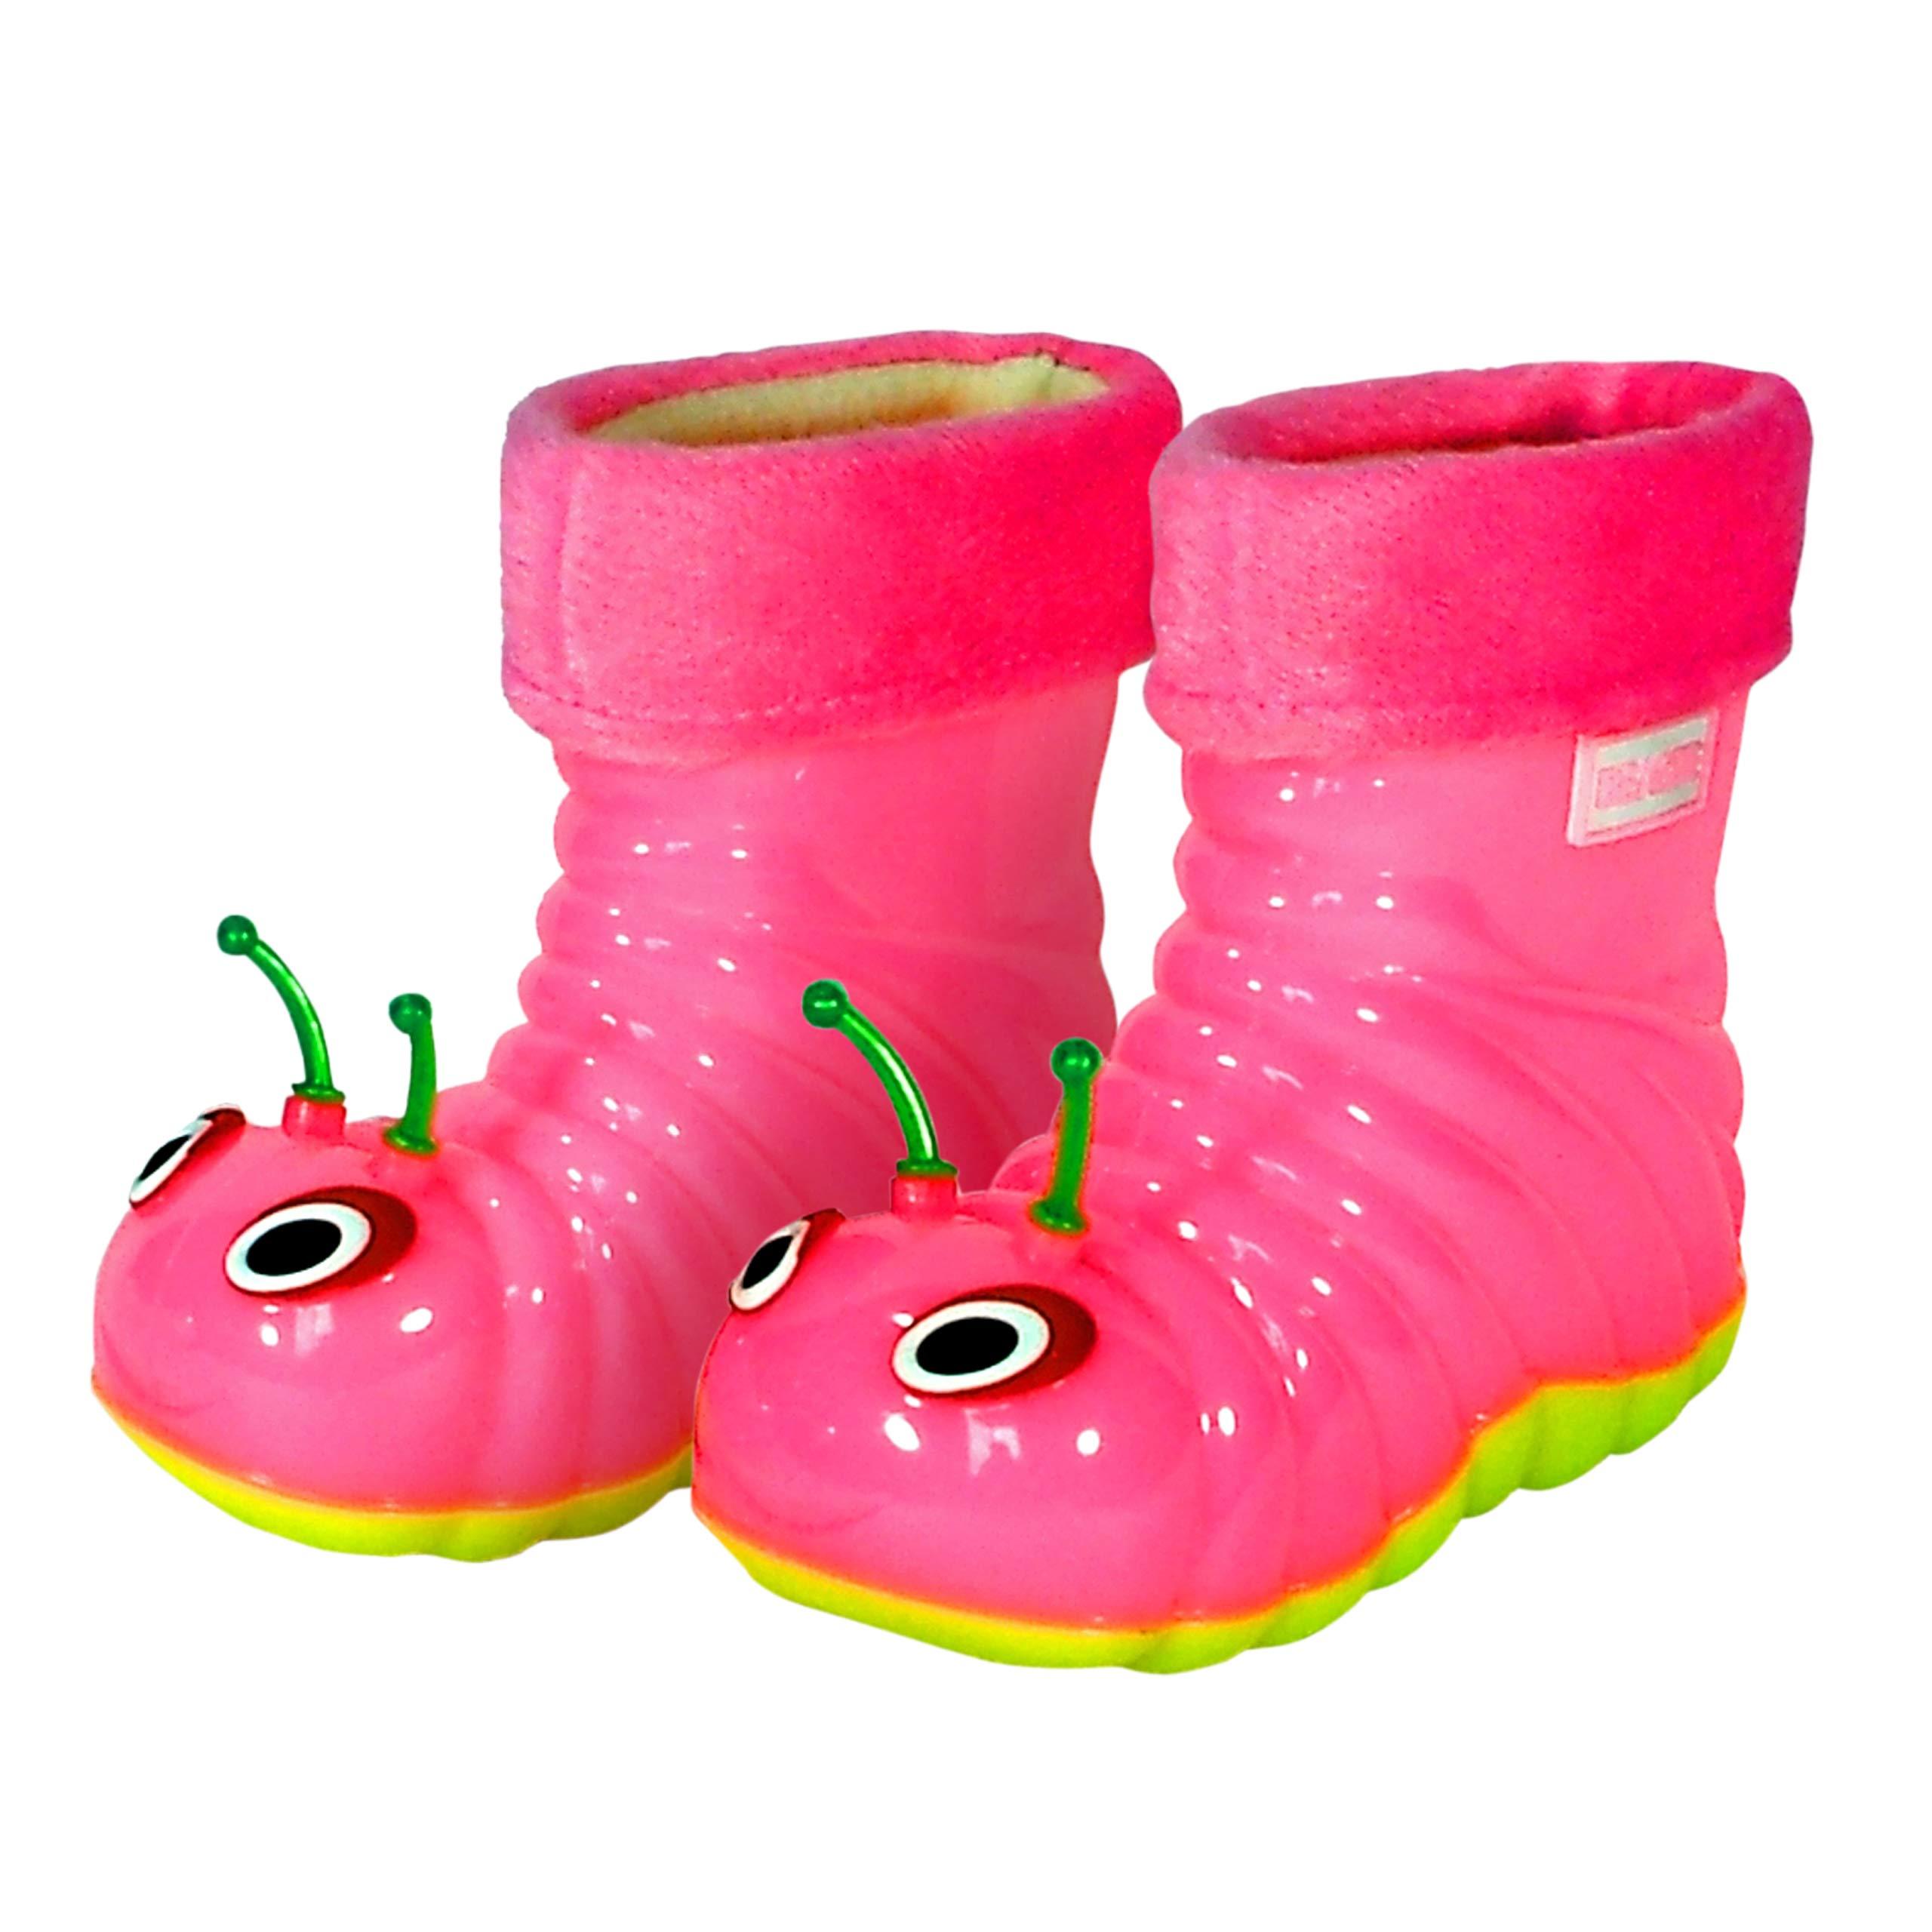 Baby Rain Boots 2-7 Years Old,Kids Toddler Boys Girls Cartoon Animal Rubber Waterproof Warm Rain Shoes Galoshes